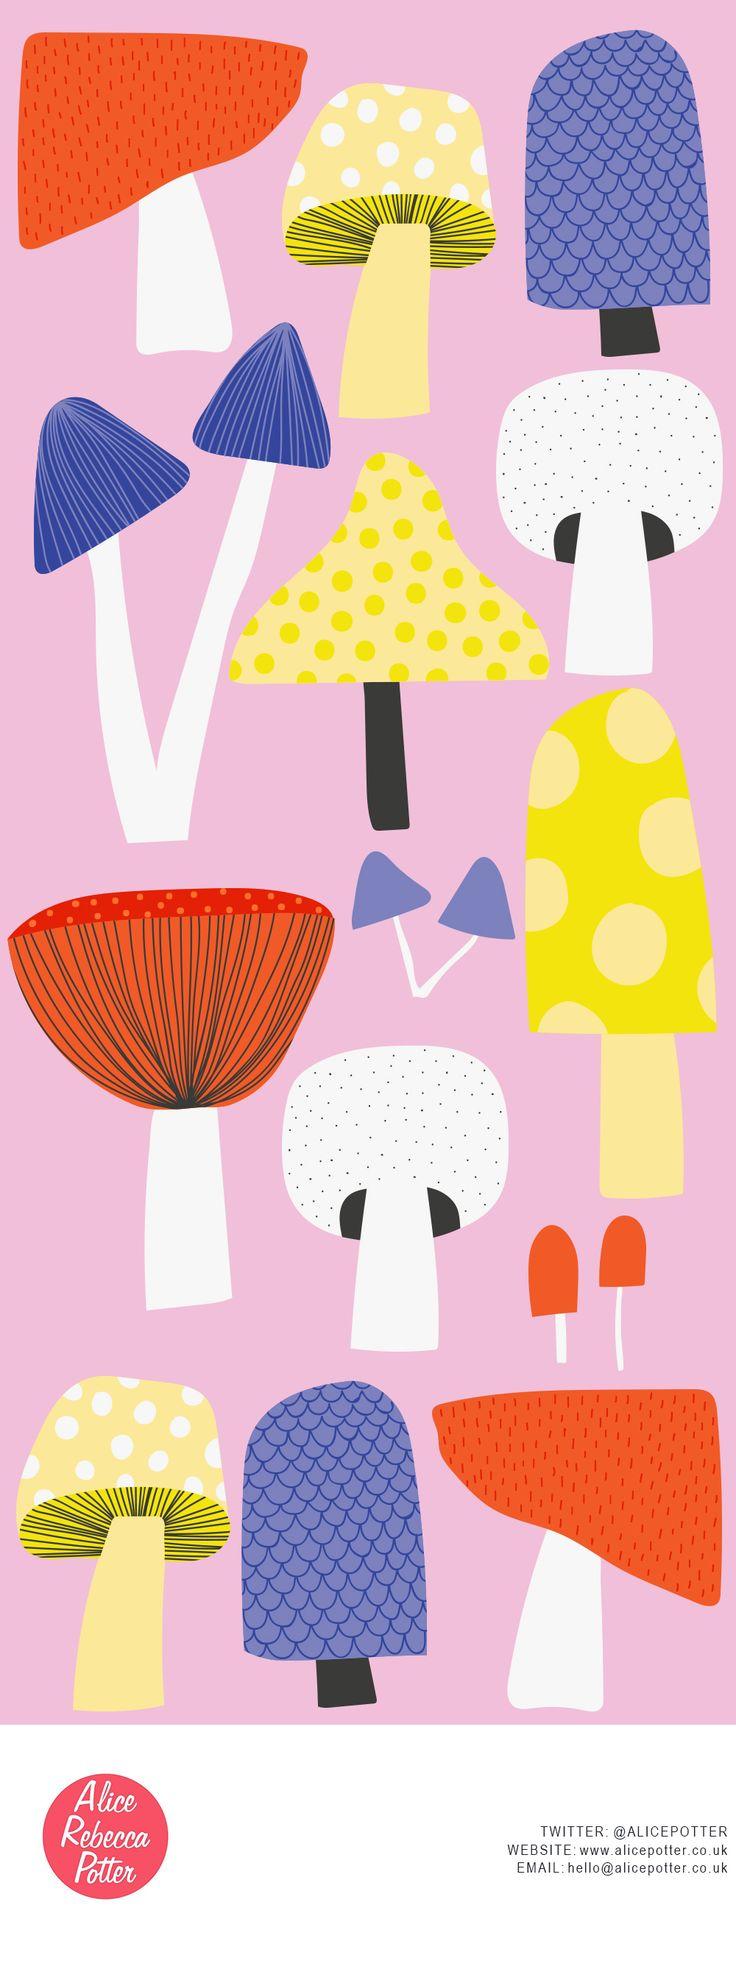 Food Illustration - Mushrooms - Food Icons - Editorial Illustration - Recipes - Surface Pattern Design - By Alice Potter Illustration www.alicepotter.co.uk